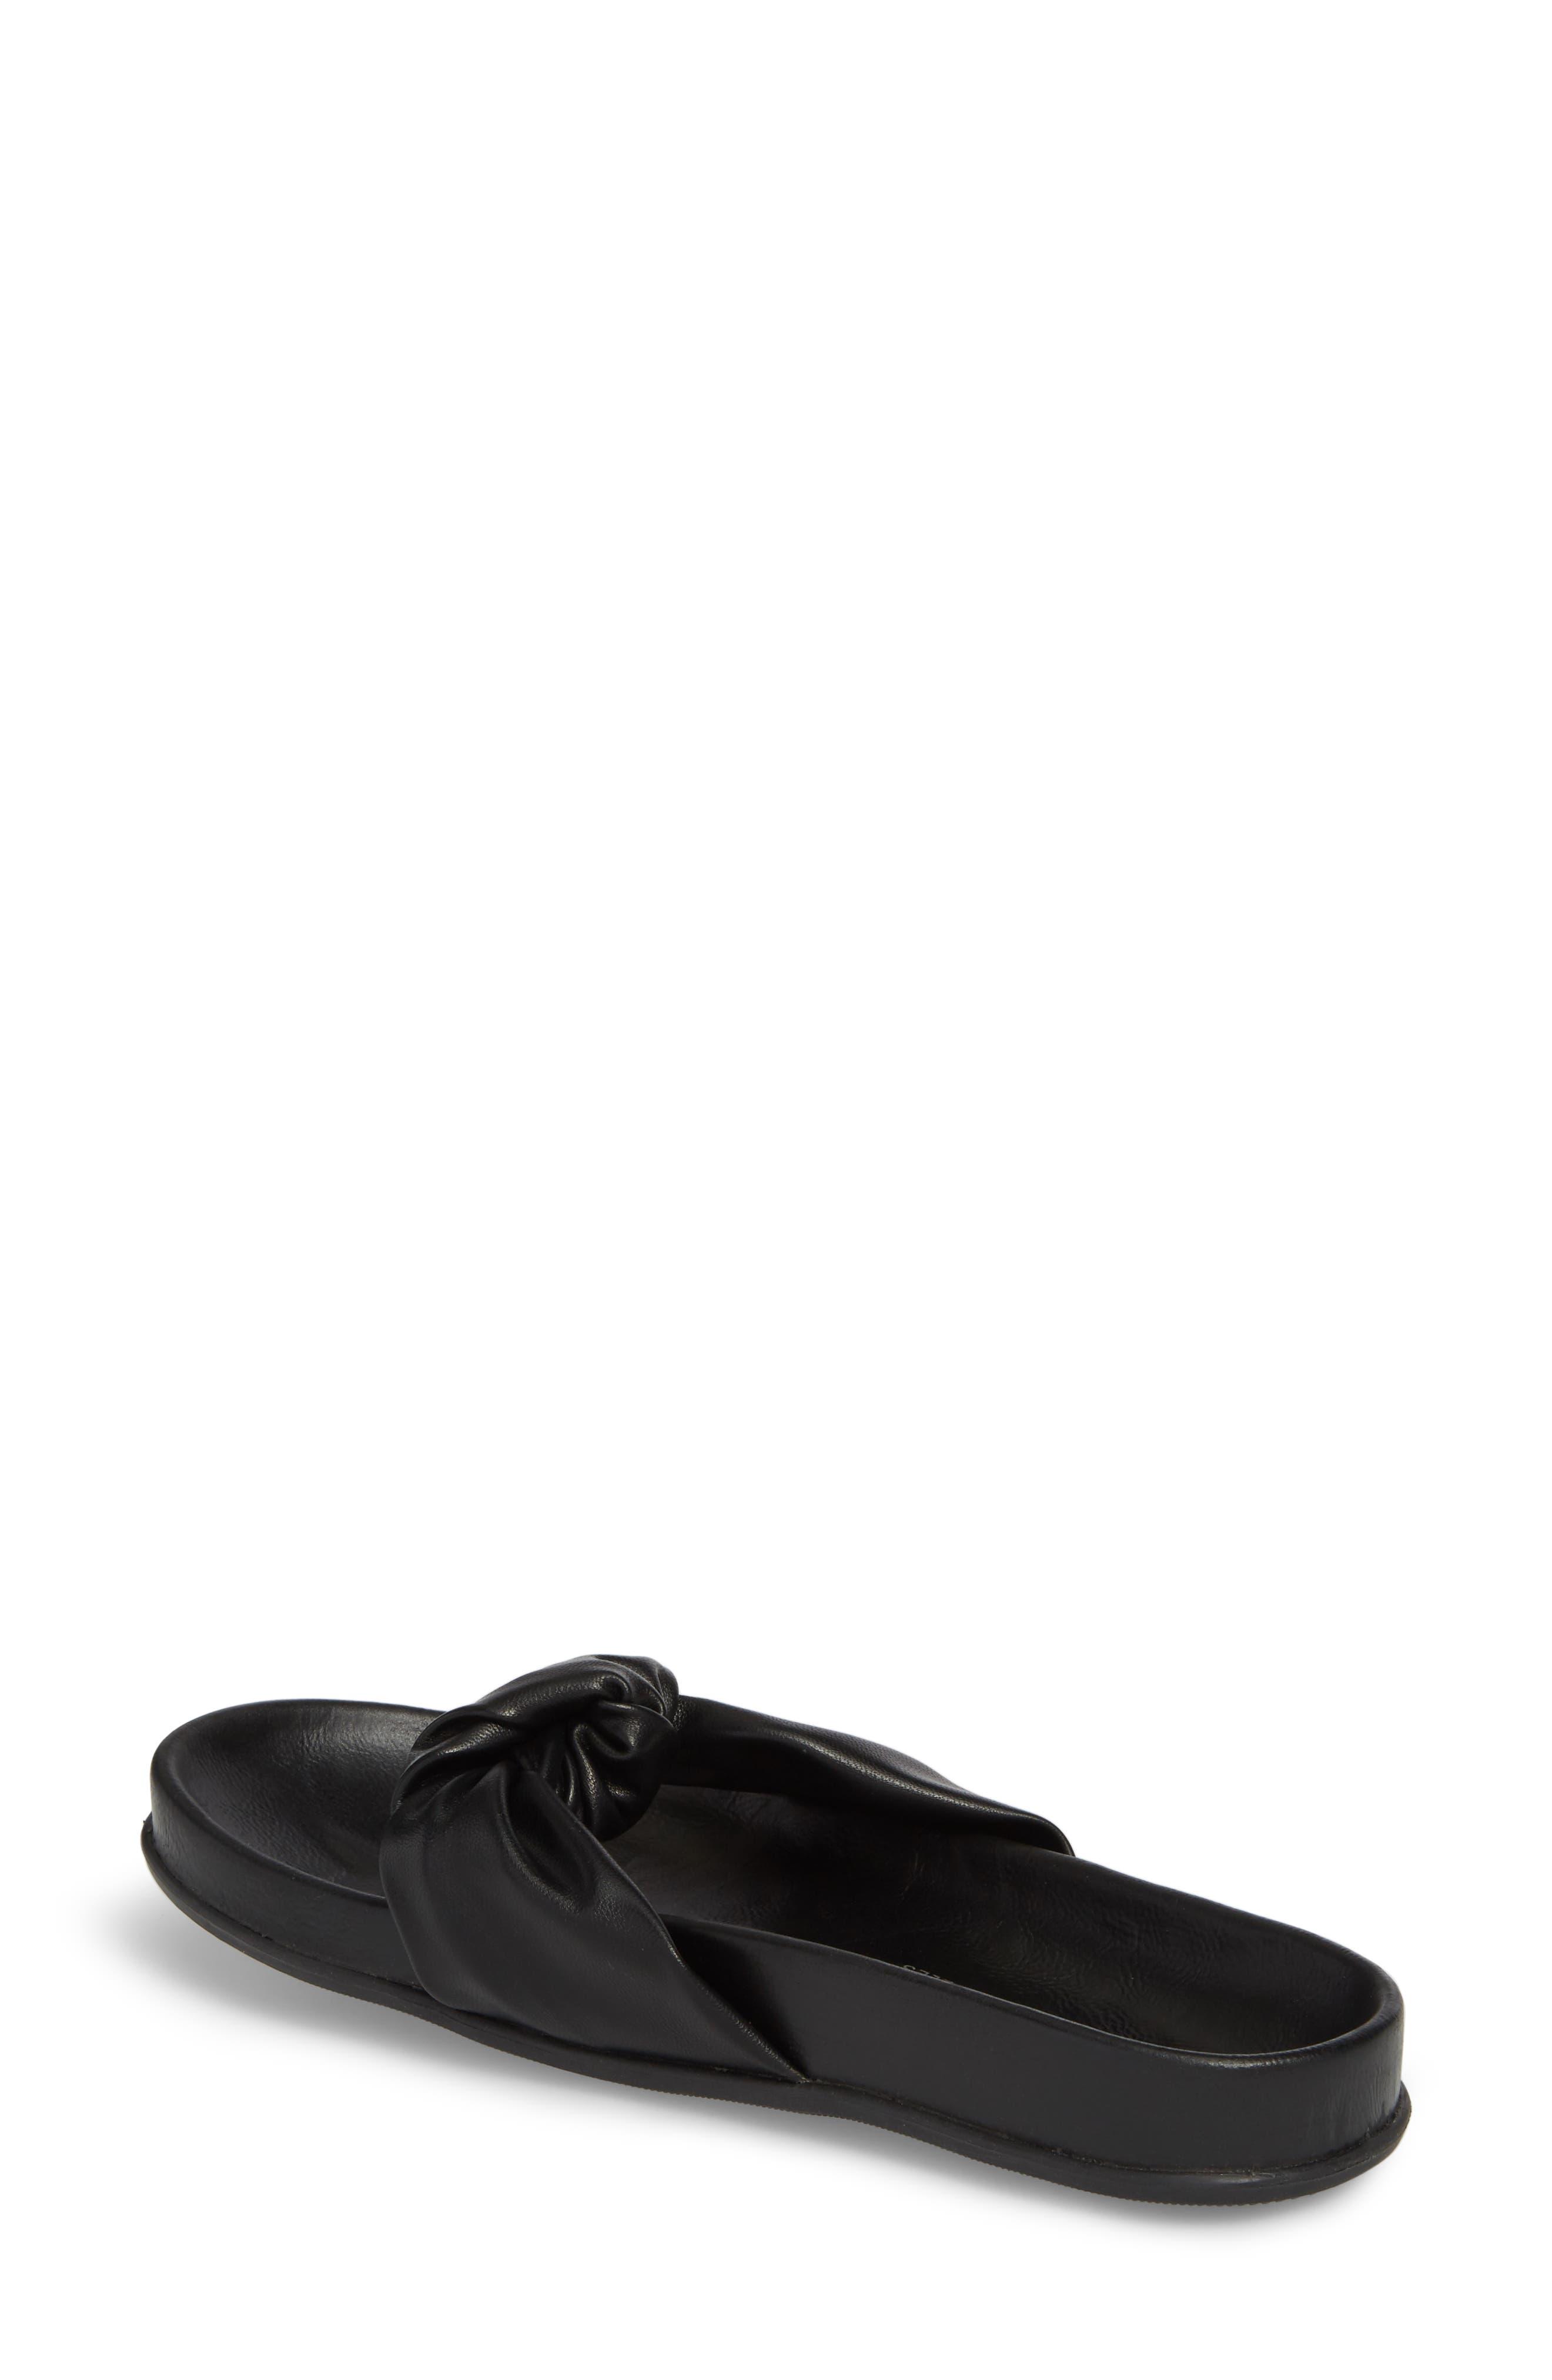 Glaze Bow Sandal,                             Alternate thumbnail 2, color,                             Black